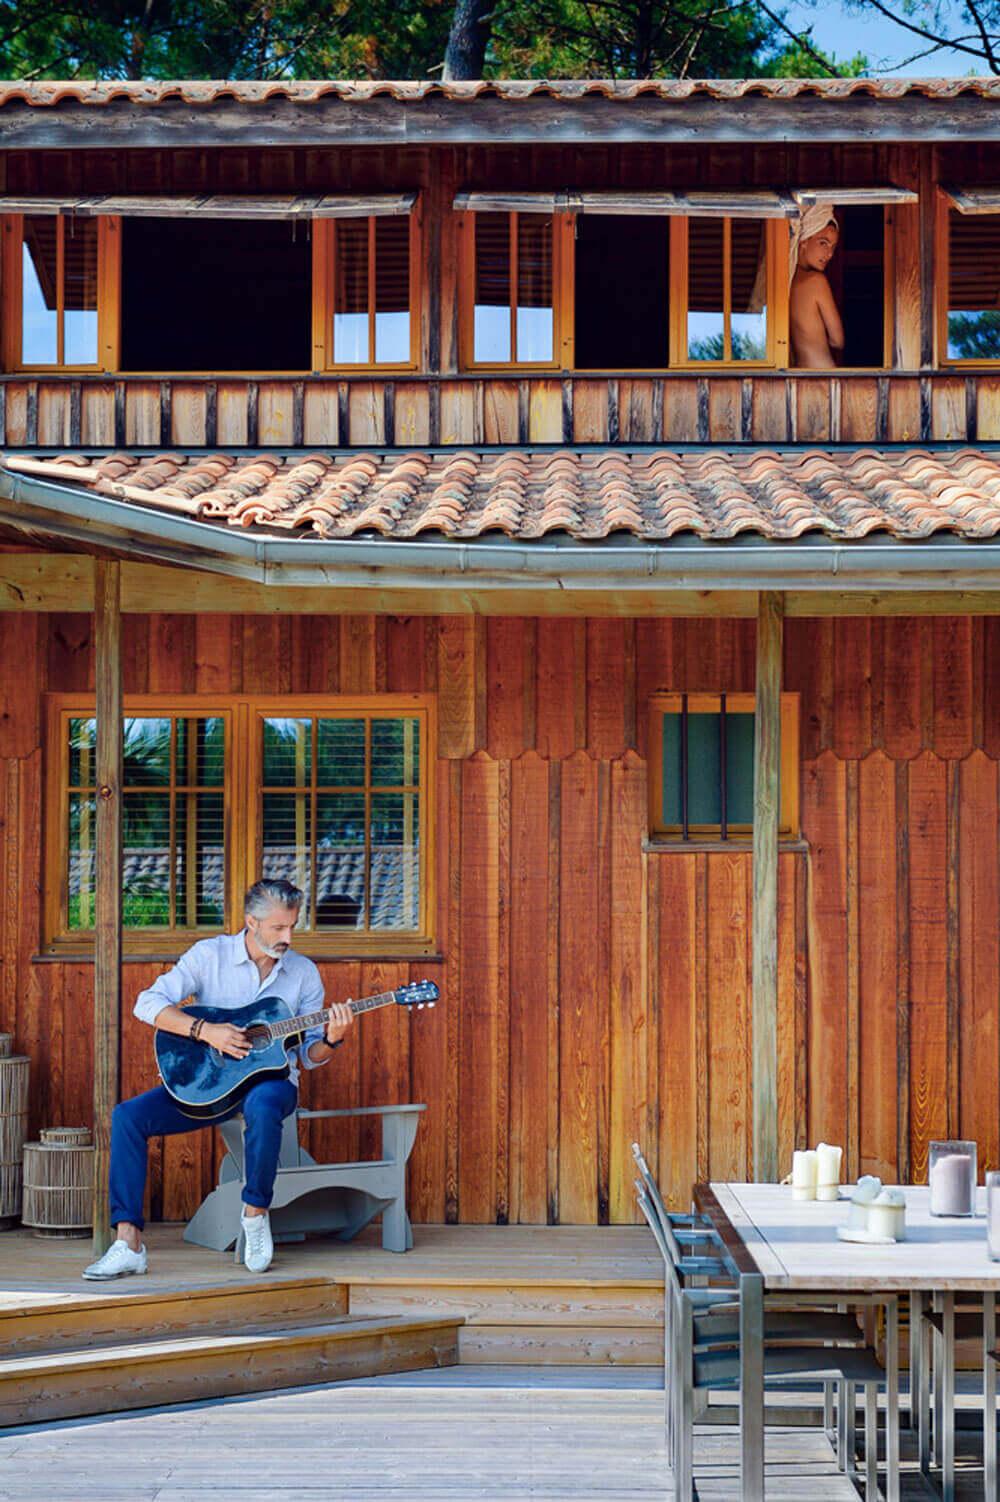 Jane villas cabanes bartherotte Cap Ferret